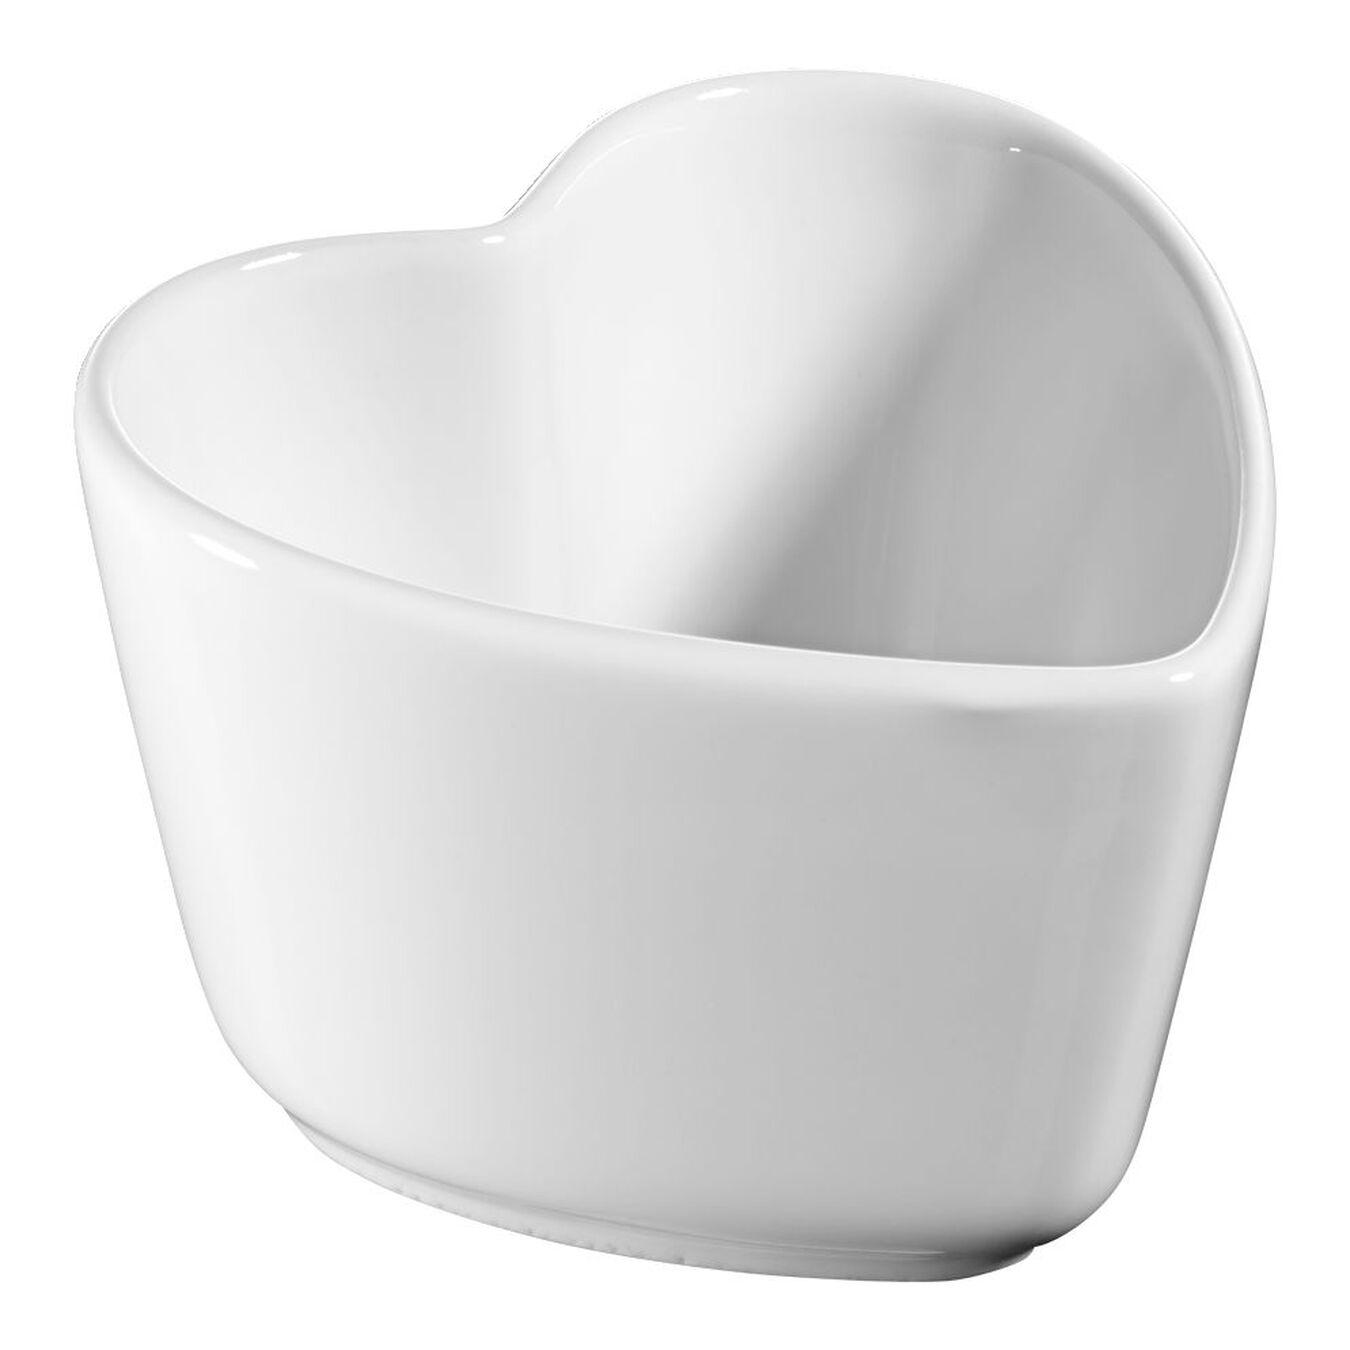 2-pc Heart Shaped Ramekin Set - White,,large 1